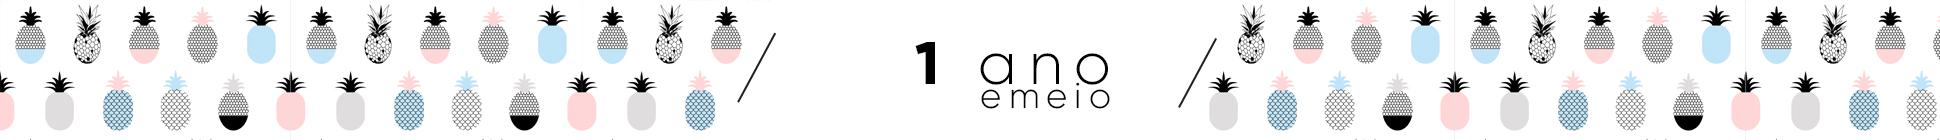 1.5 anos